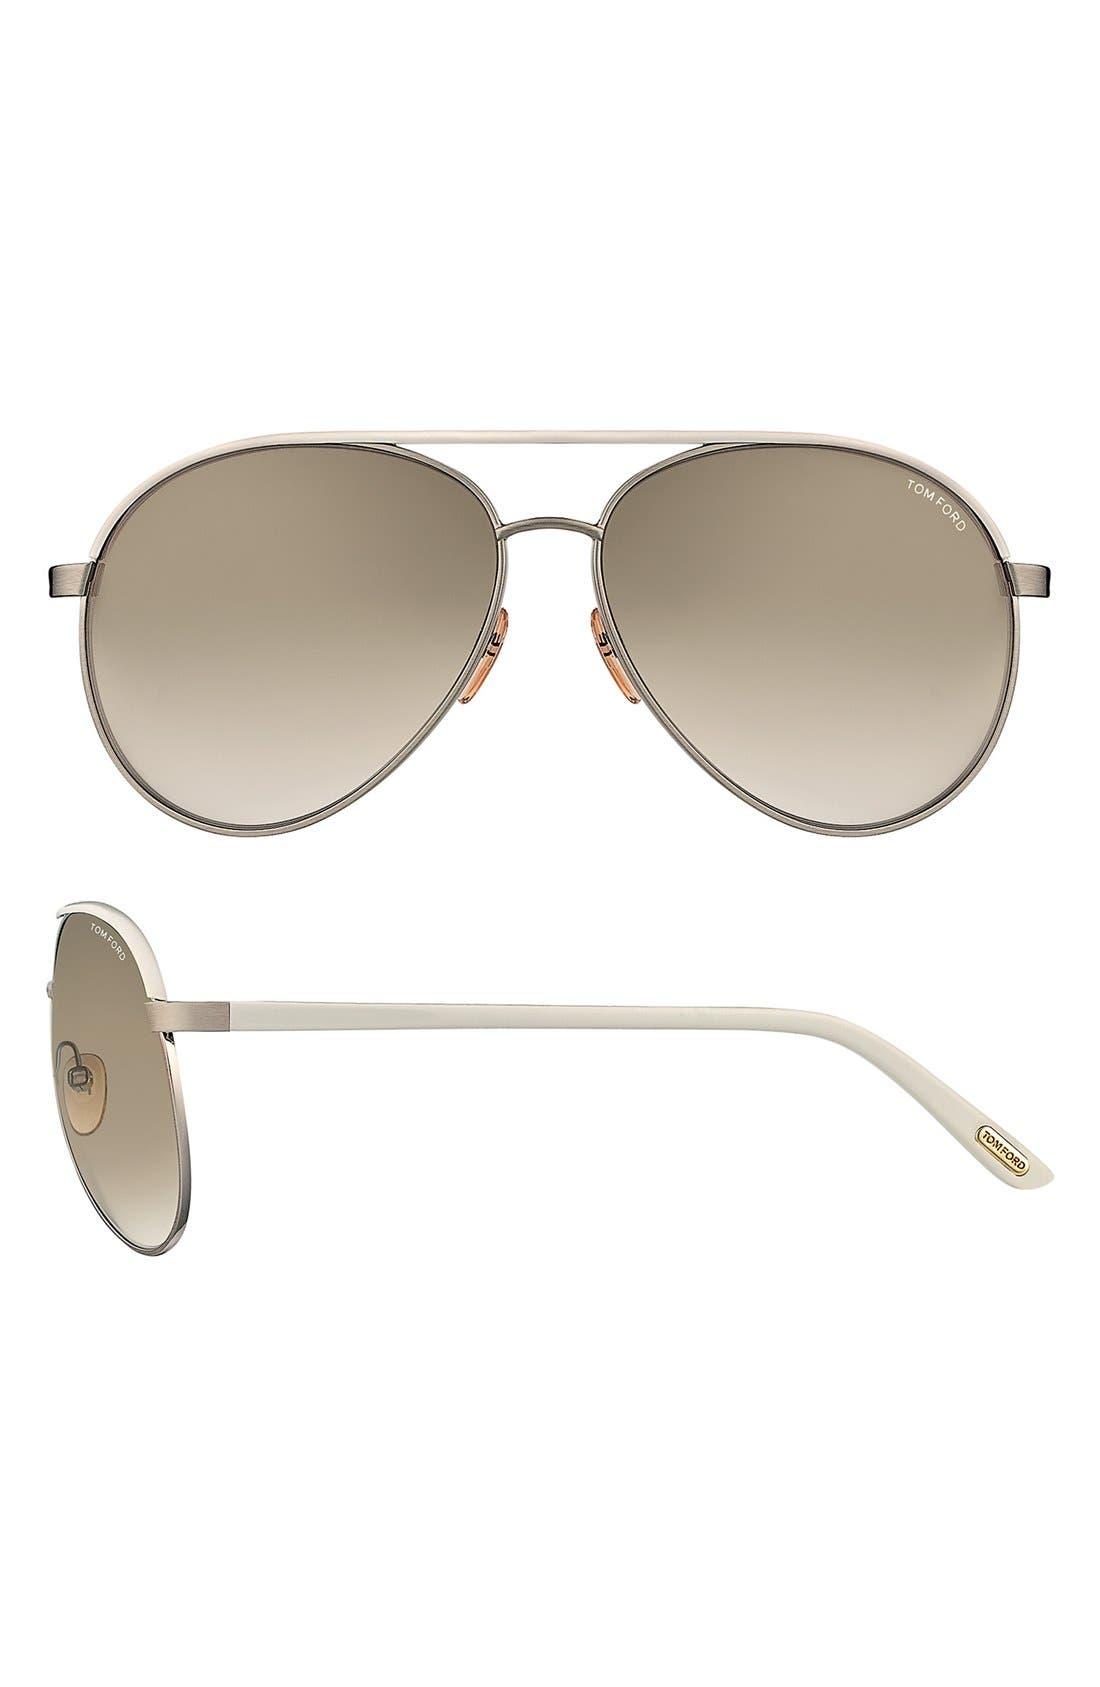 Main Image - Tom Ford 'Silvano' 59mm Polarized Sunglasses